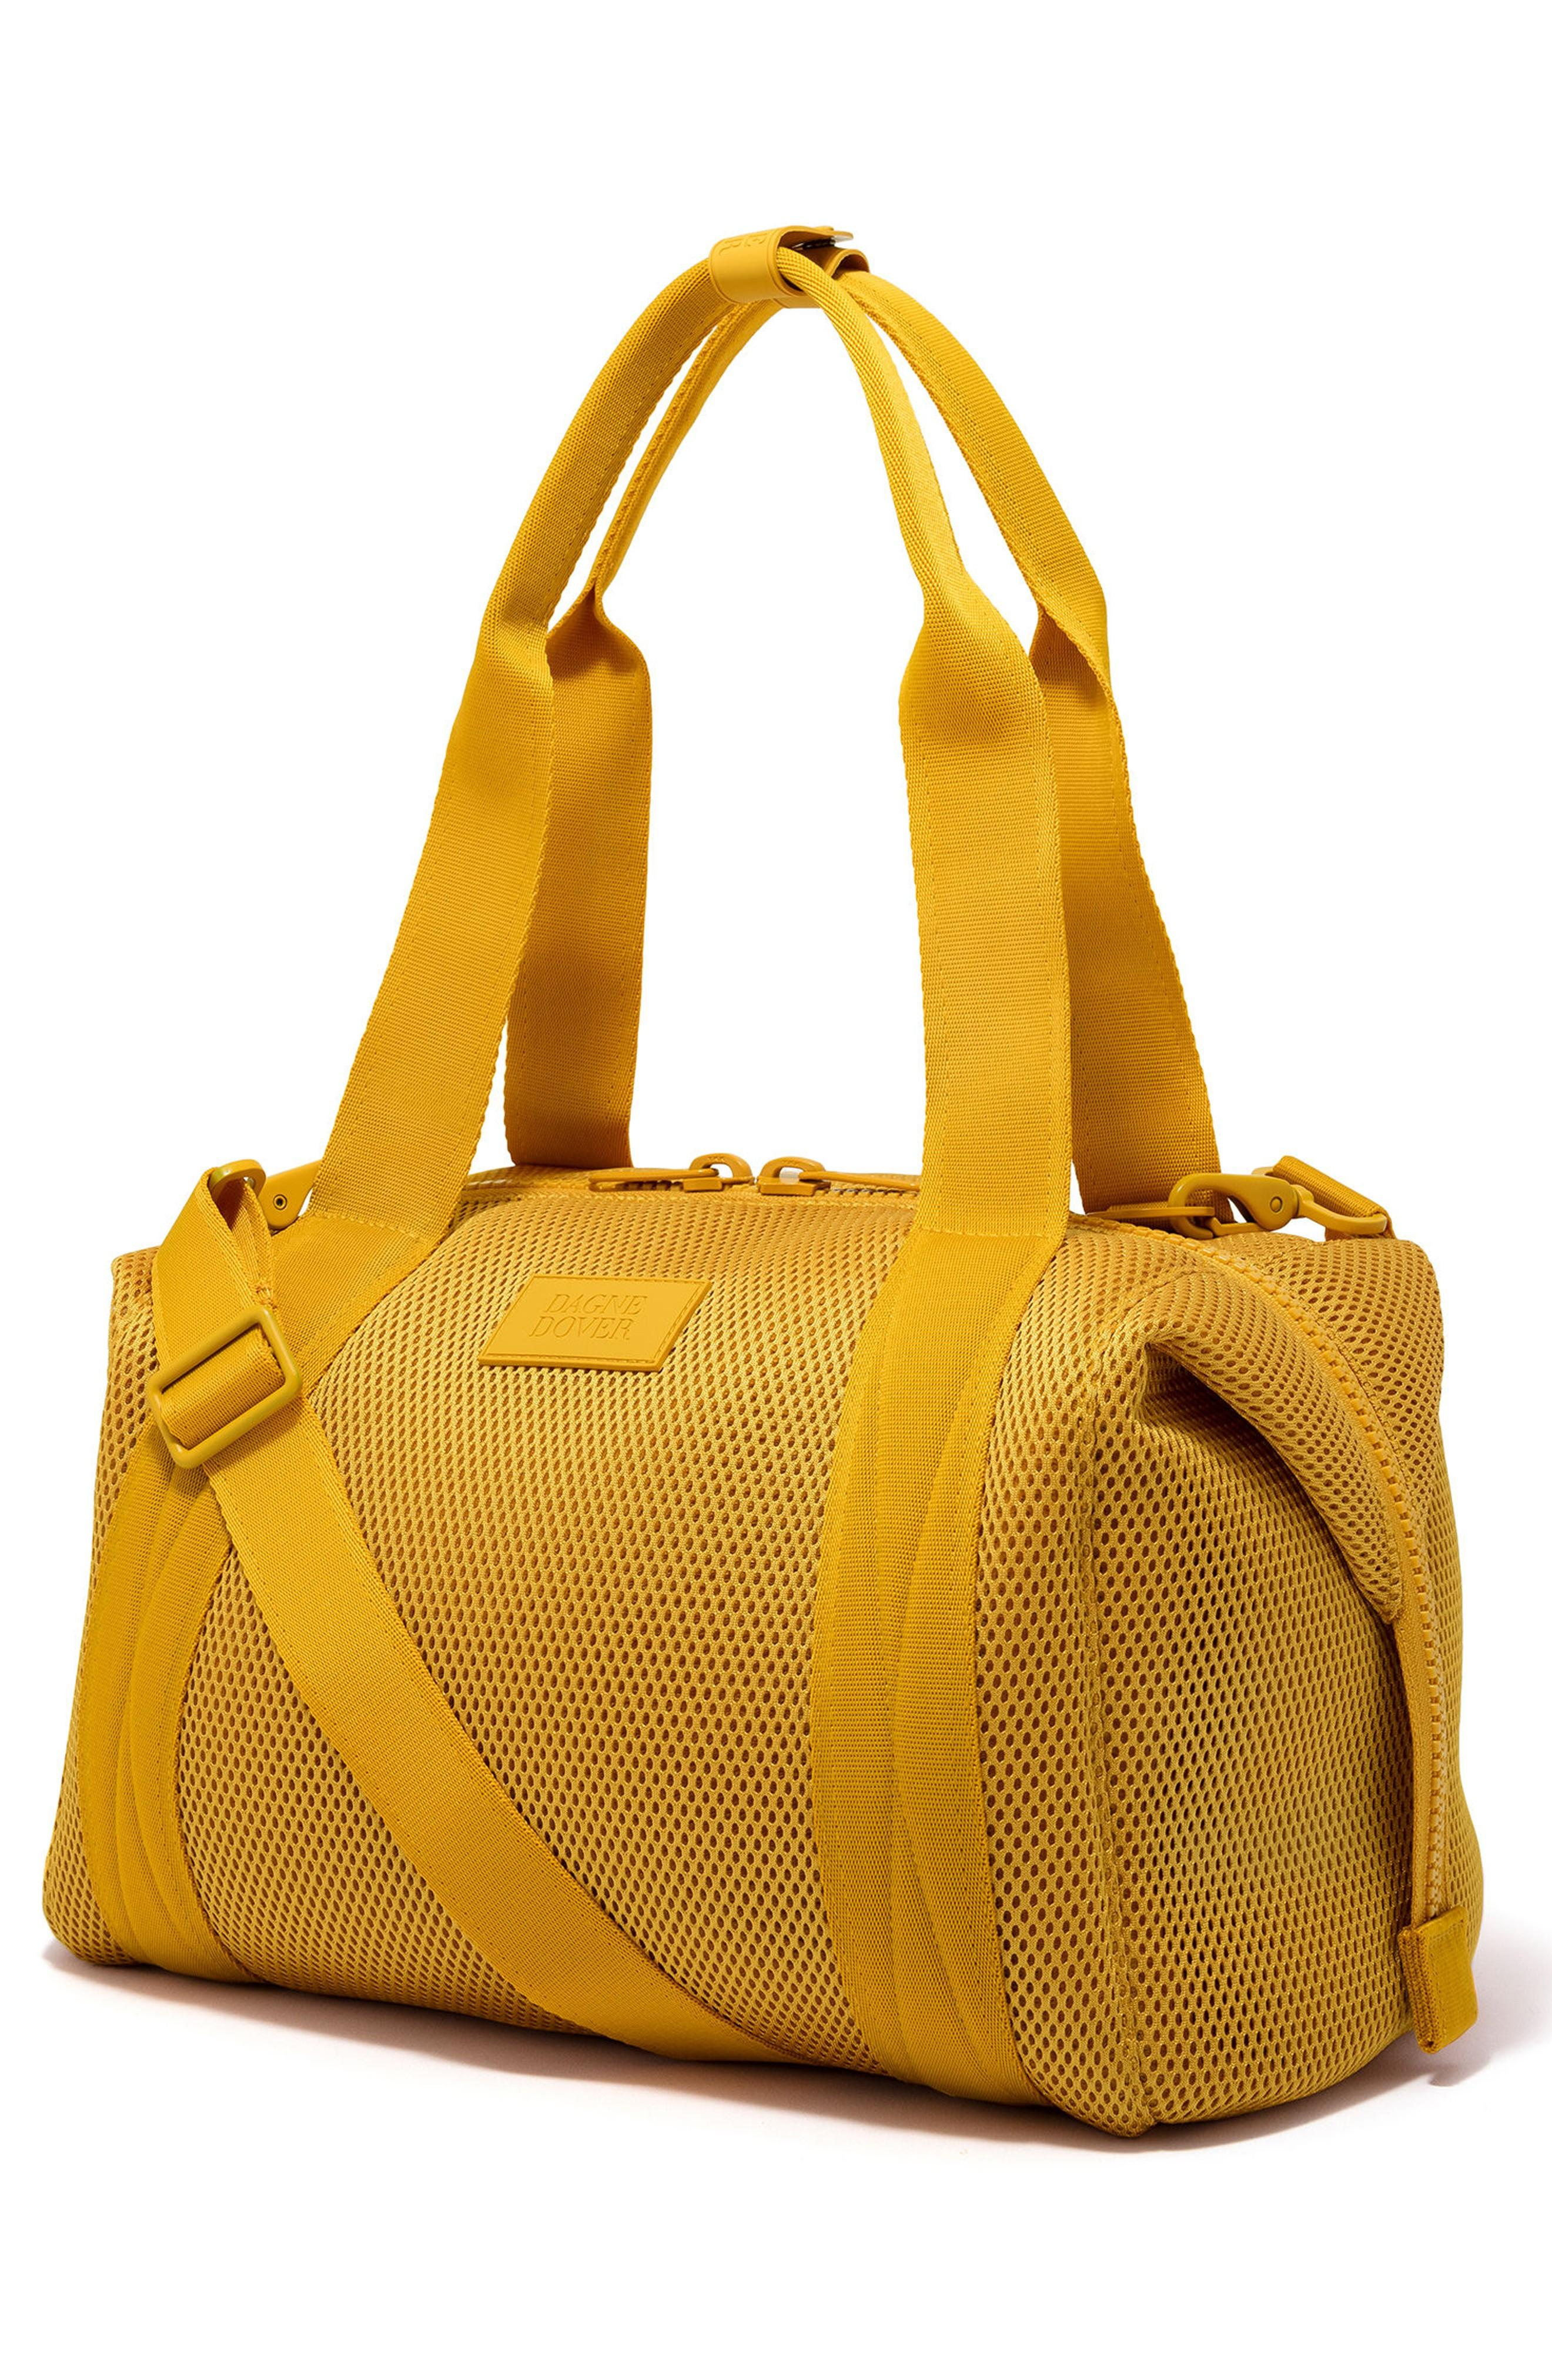 Dagne Dover 365 Medium Landon Neoprene Carryall Duffel Bag - Yellow In Sol Air Mesh